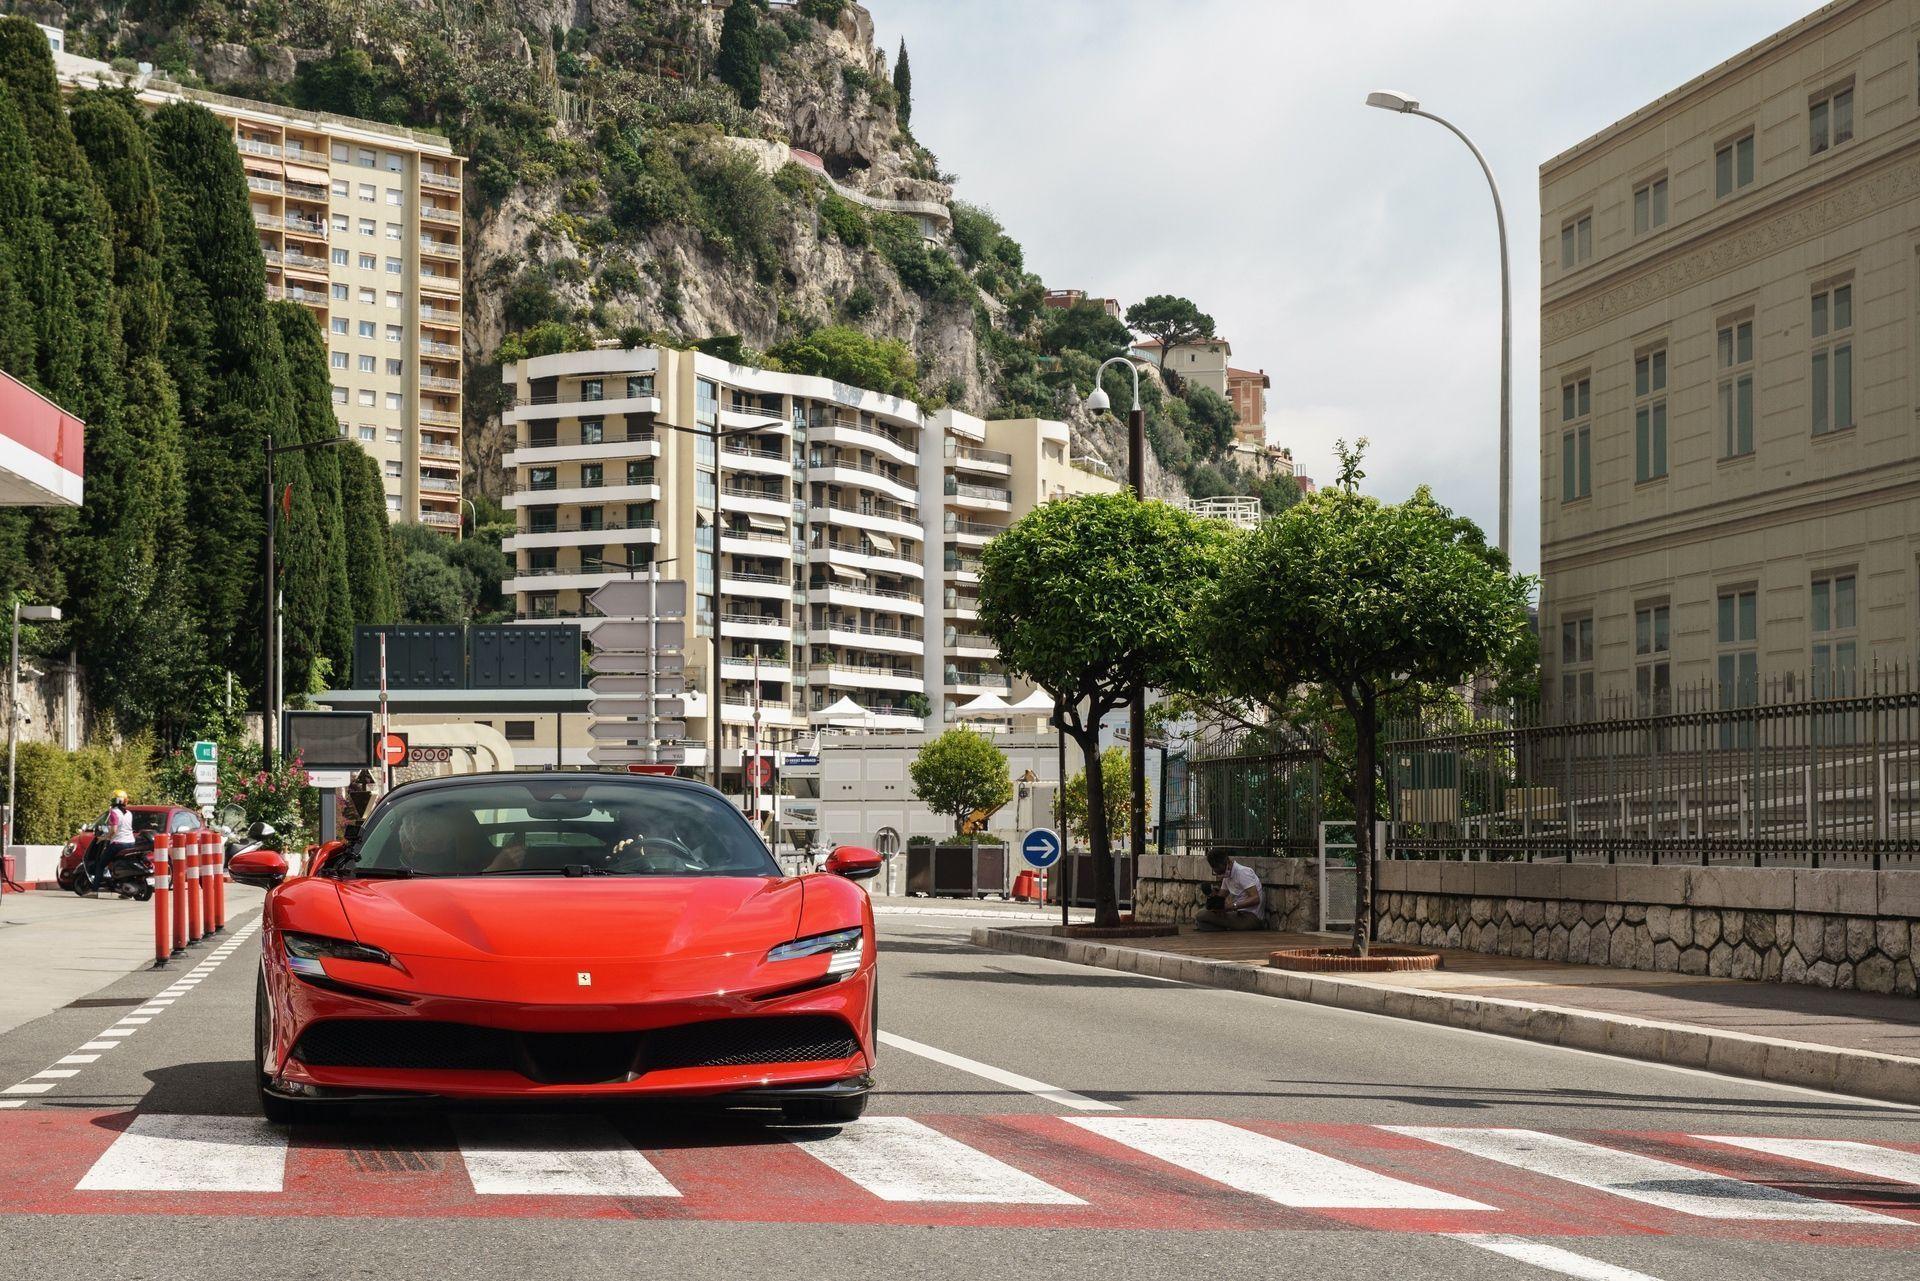 Ferrari_SF90_Stradale_Claude_Charles_Leclerc_Monaco_2020_0007